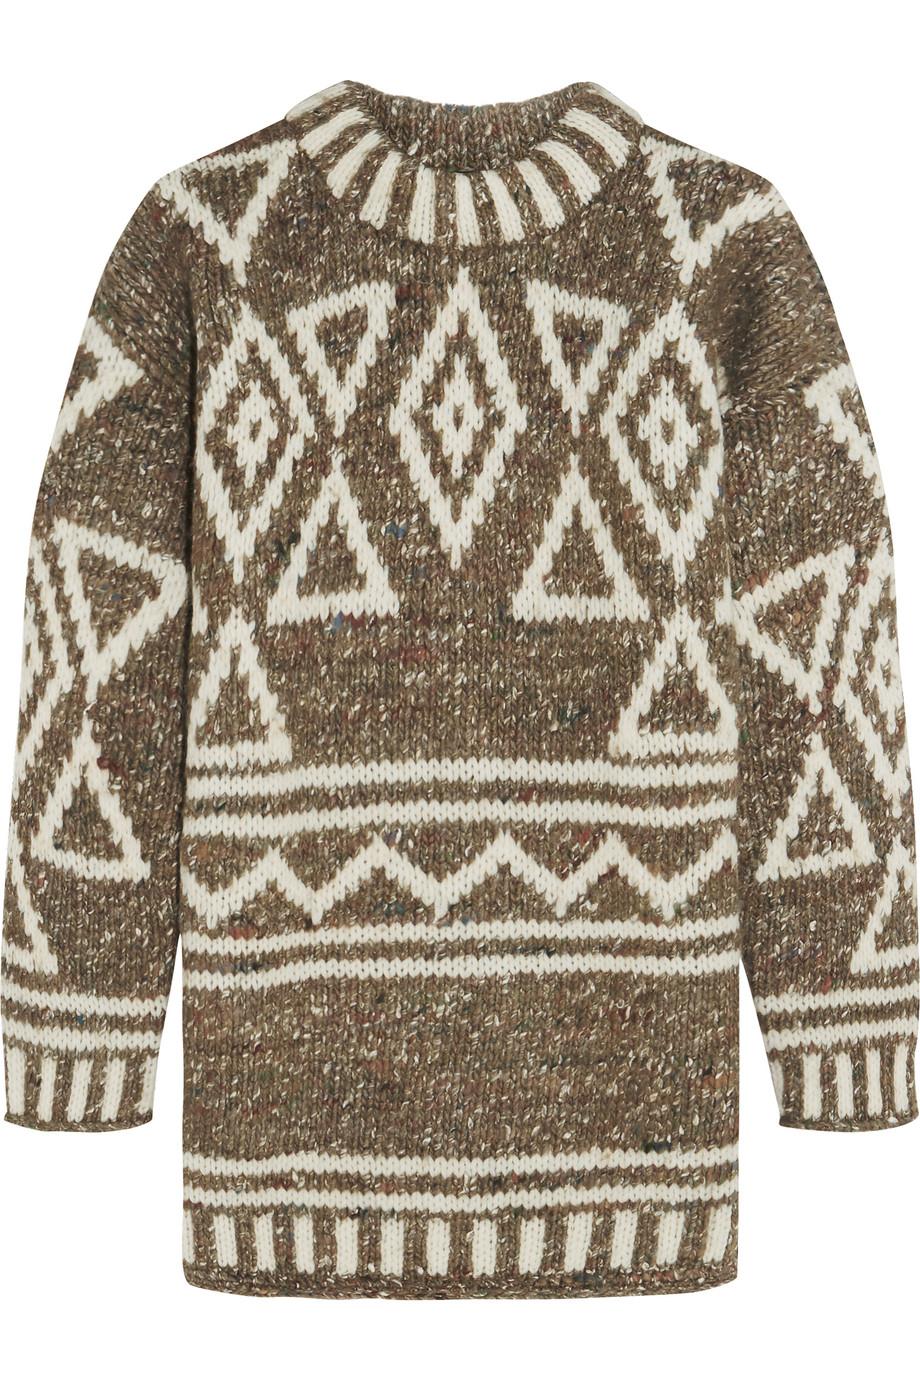 J.Crew Intarsia Merino Wool, Alpaca and Silk-Blend Sweater, Brown, Women's